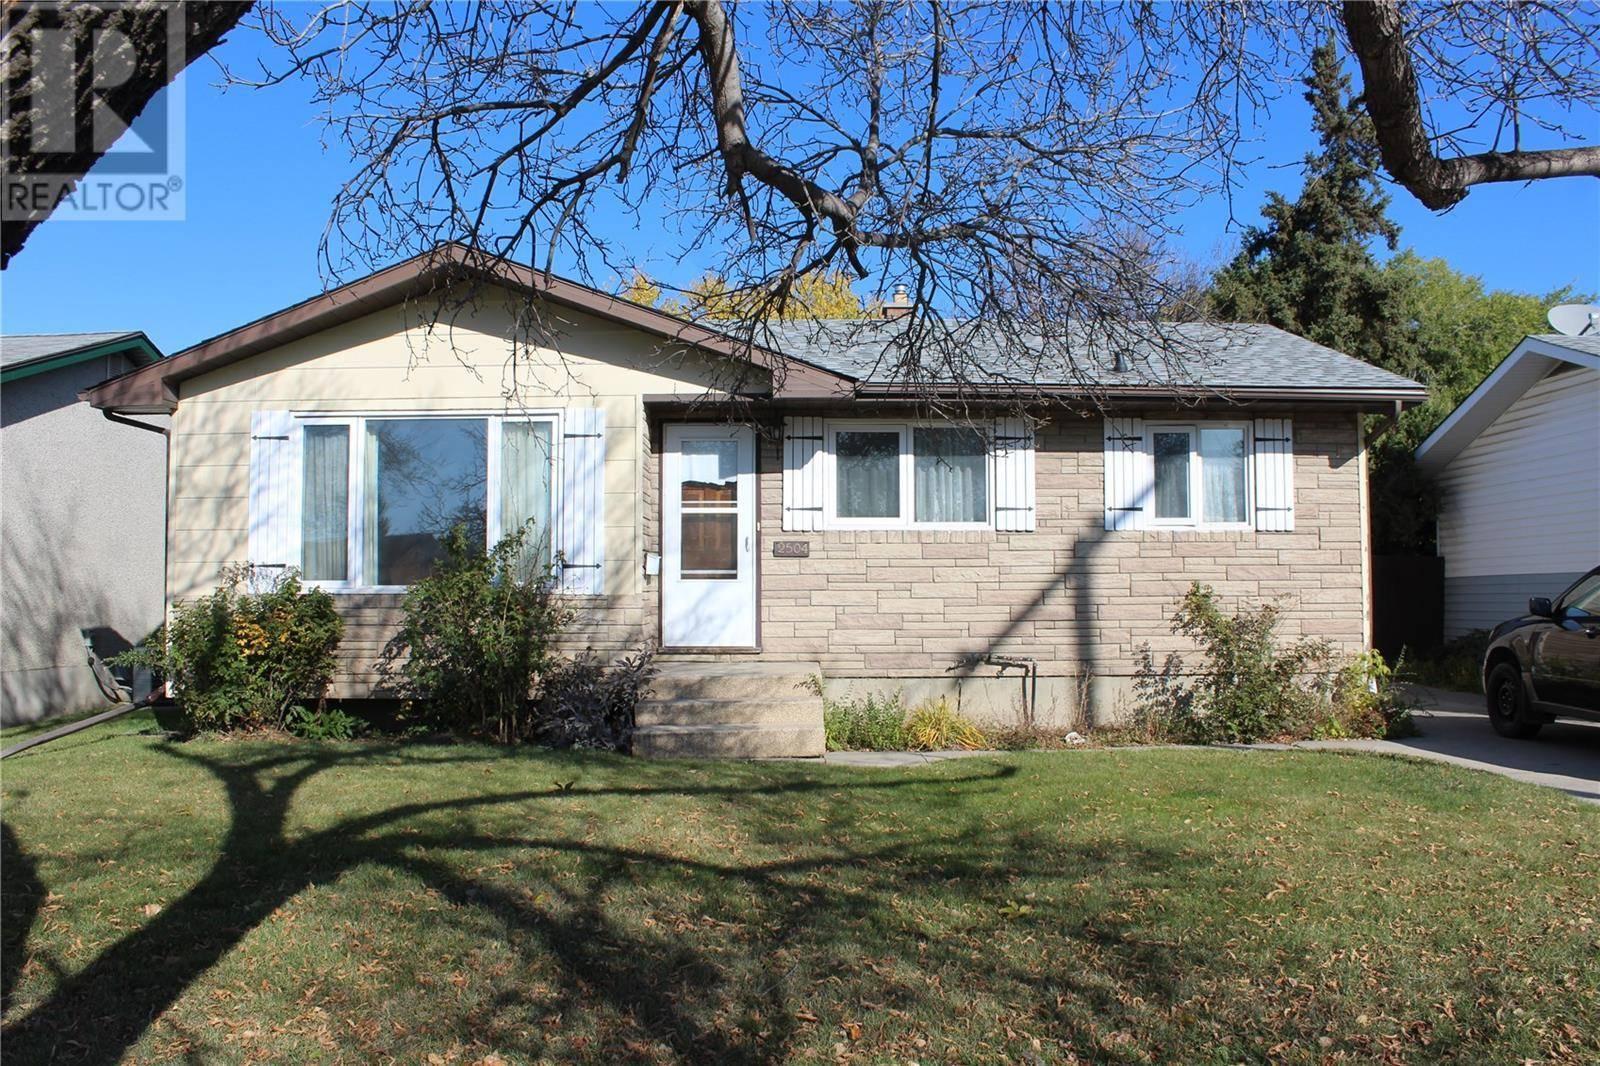 House for sale at 2504 33rd St W Saskatoon Saskatchewan - MLS: SK788502